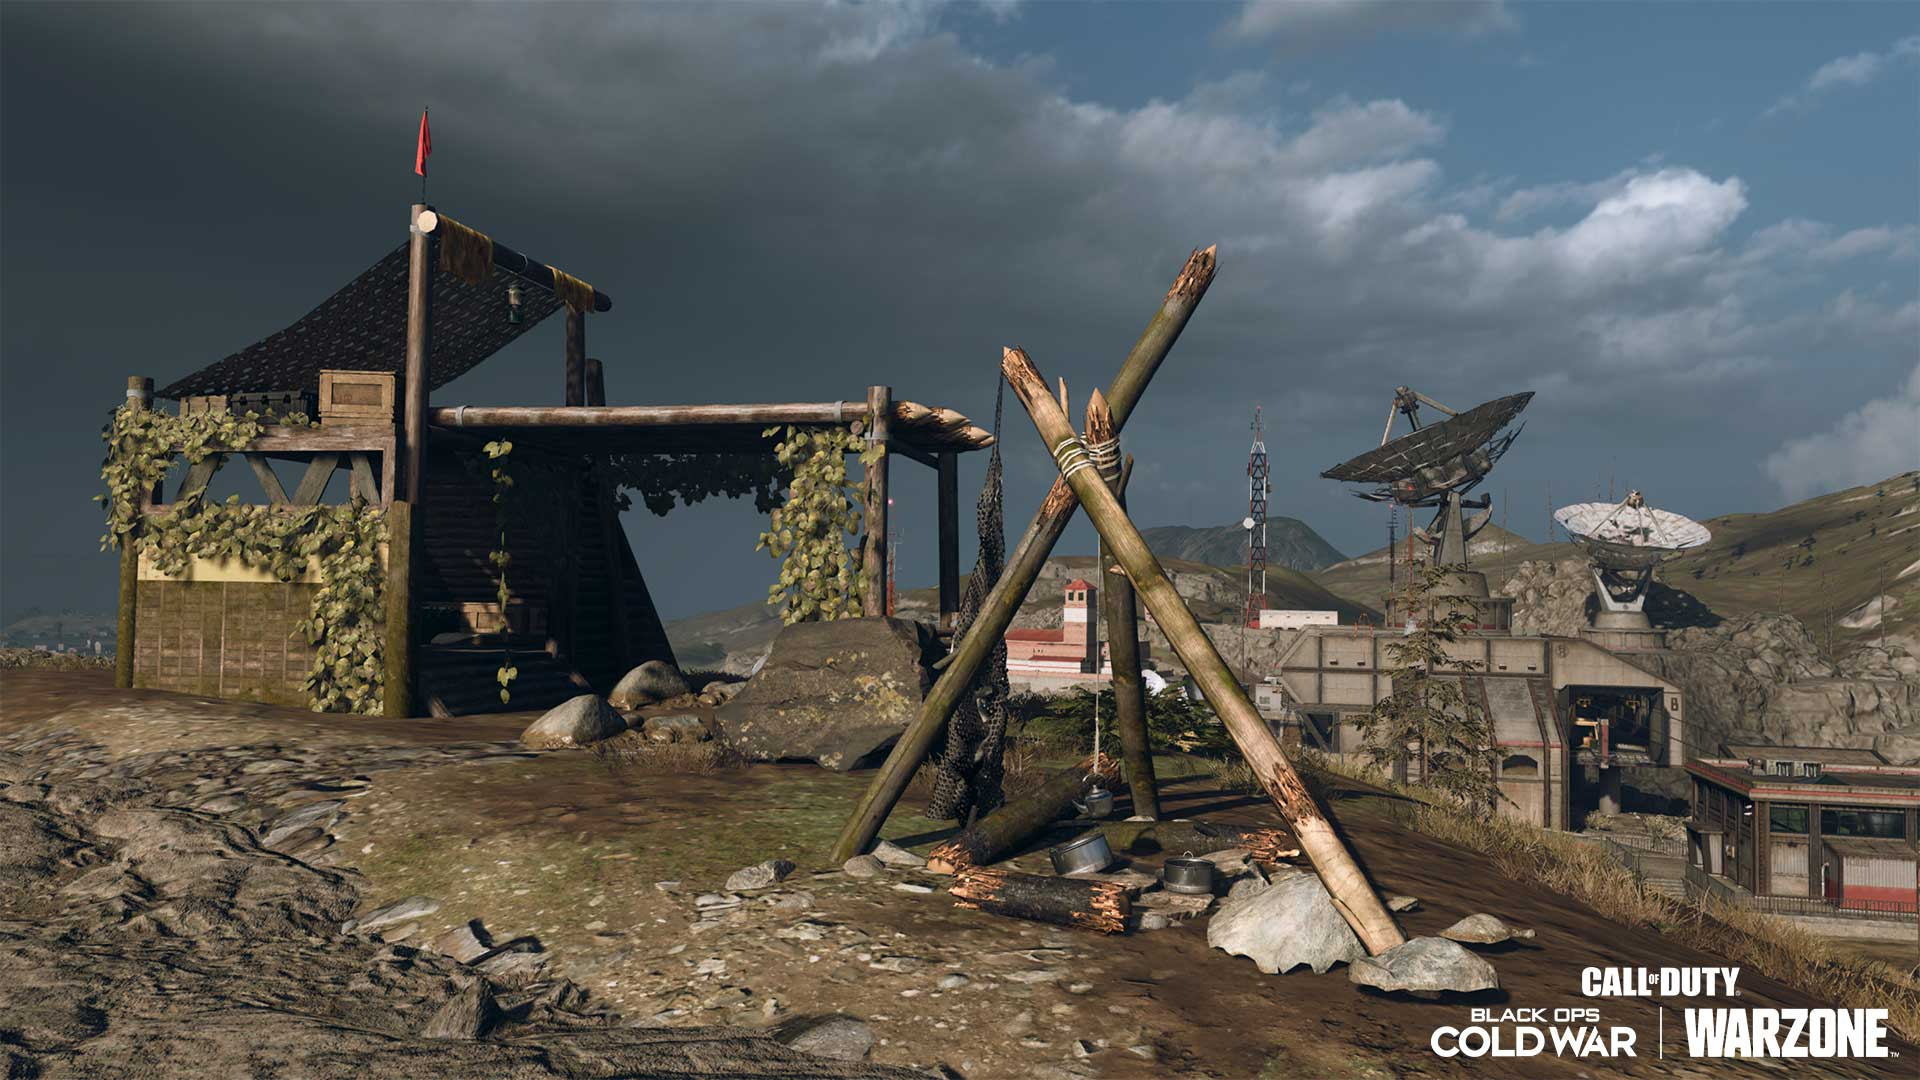 Rambo y John McClane debutan en Call of Duty: Black Ops Cold War y Warzone 3